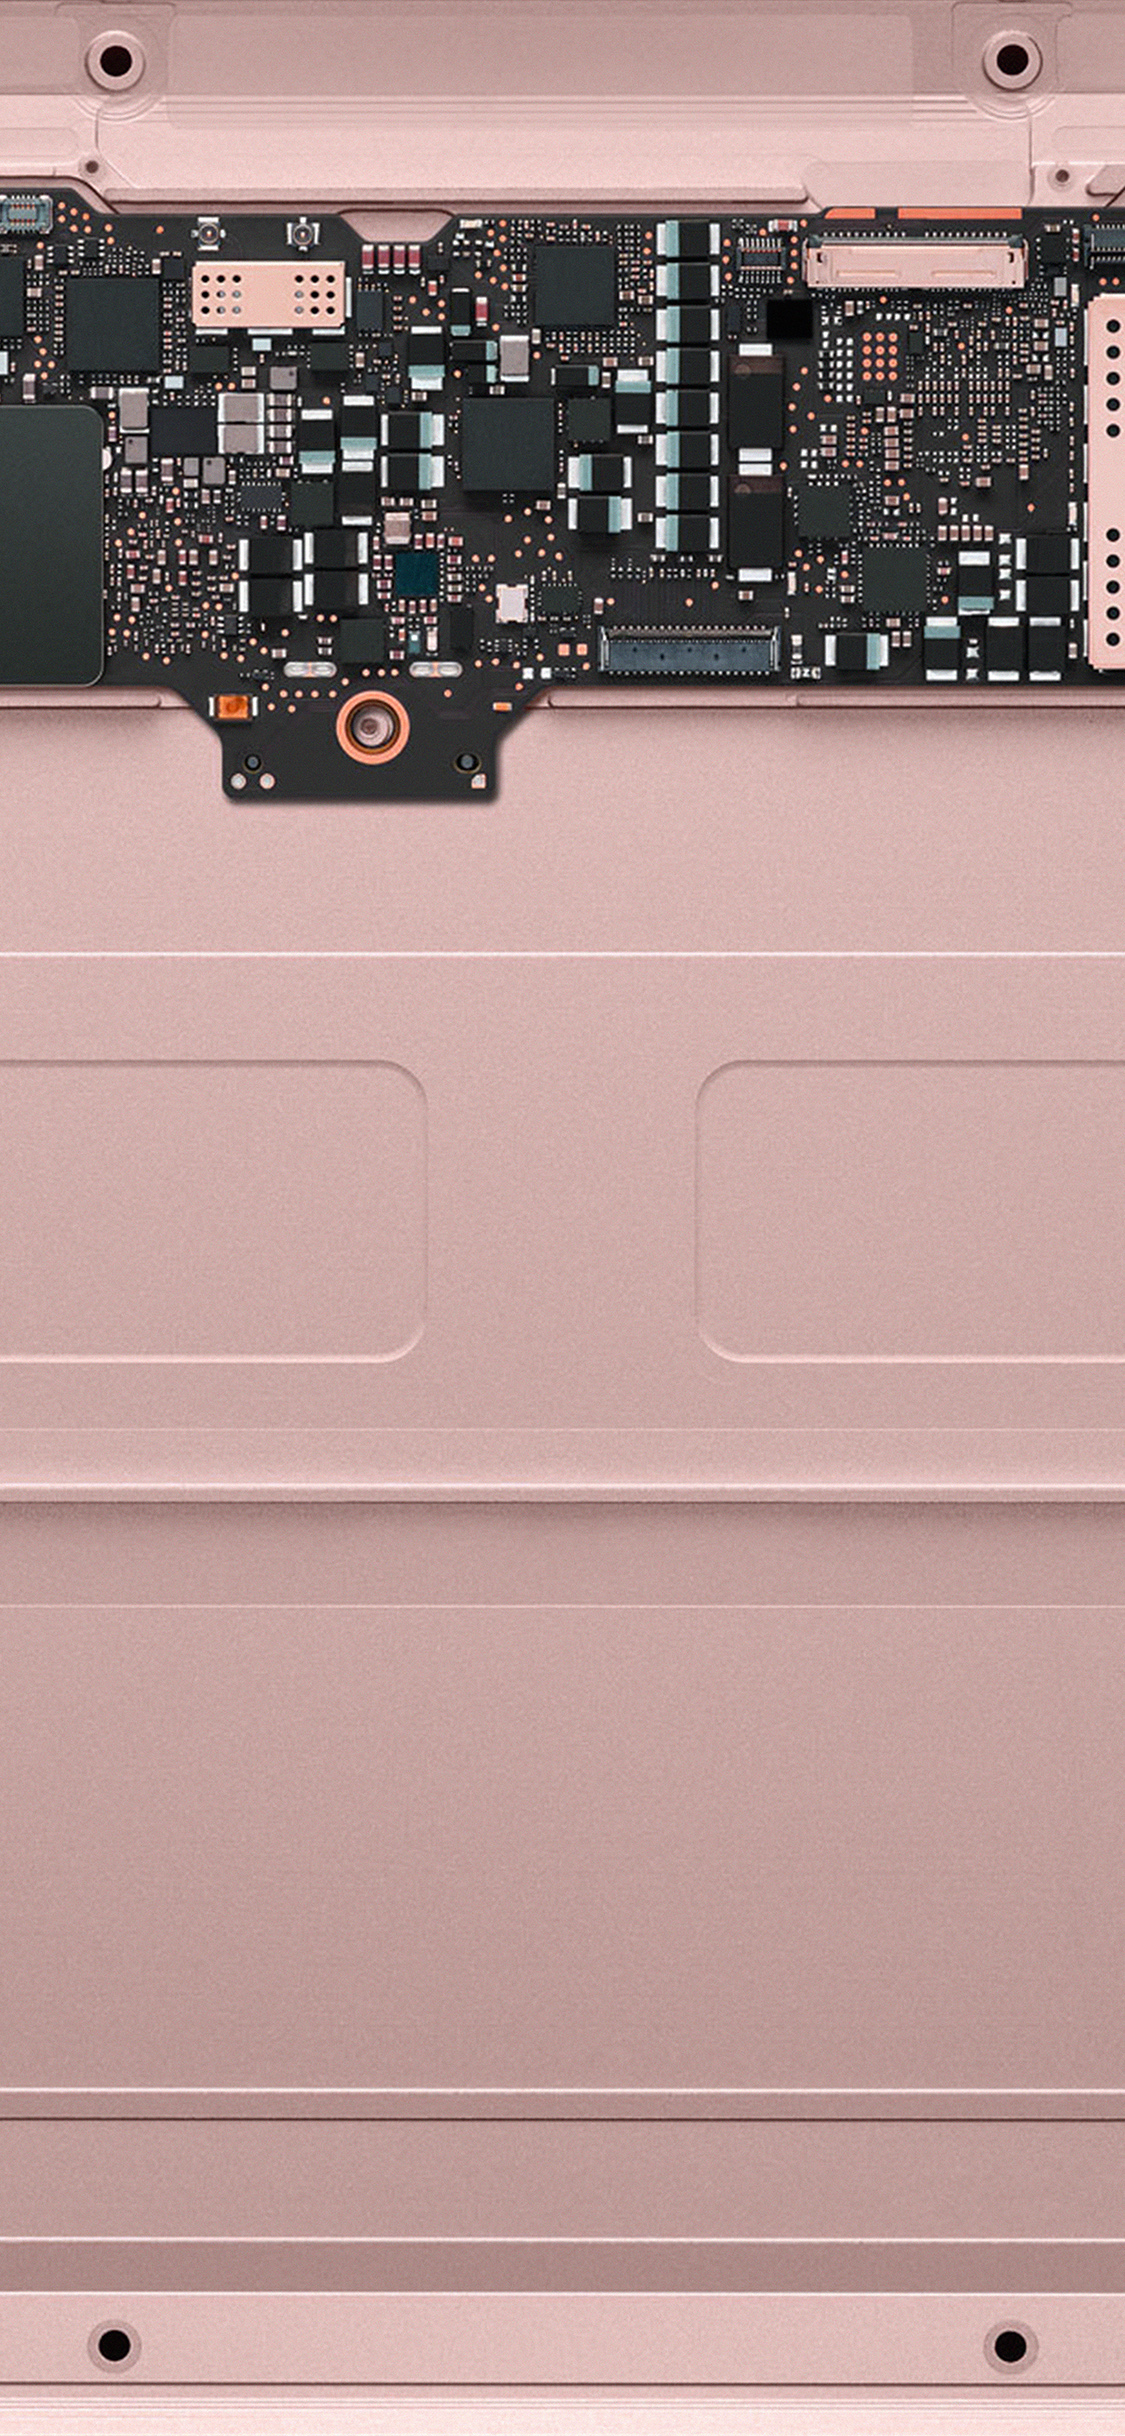 iPhoneXpapers.com-Apple-iPhone-wallpaper-au53-inside-macbook-gold-apple-illustration-art-rose-gold